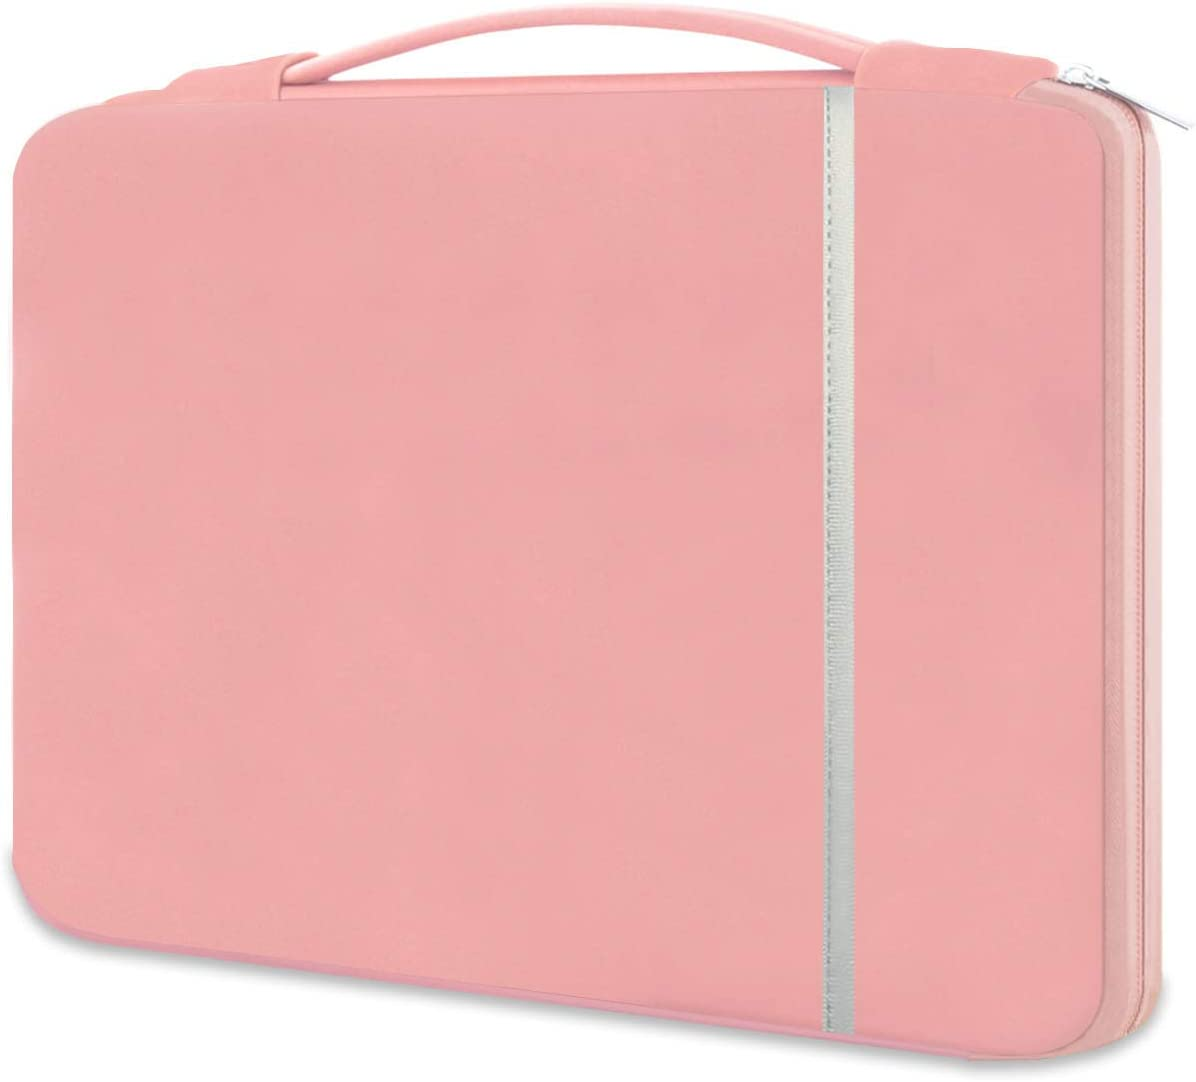 HESTECH Chromebook Case, 11.6-12.3 inch Neoprene Laptop Sleeve Case Bag Handle Compatible with Acer Chromebook r11/HP Stream/Samsung/Lenovo C330/ASUS C202/MacBook air 11/ Surface Pro3/Pro4,Rose Quartz